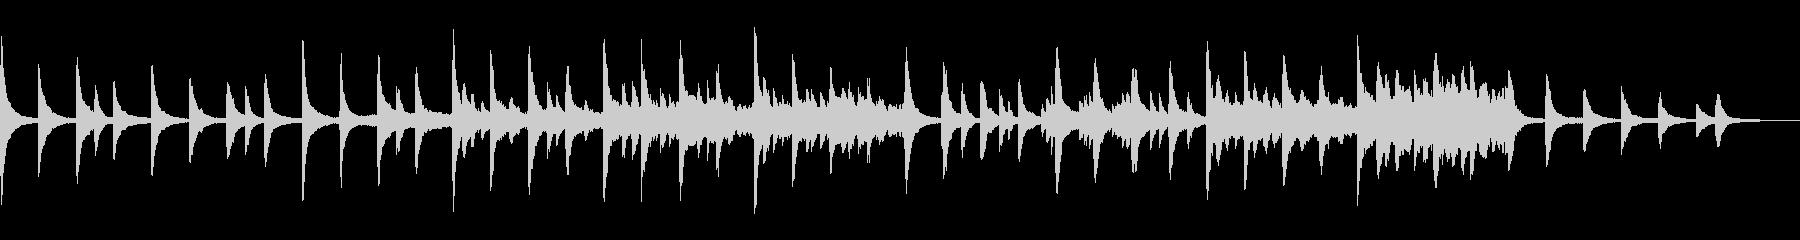 KANTスピーチ用BGM200709の未再生の波形